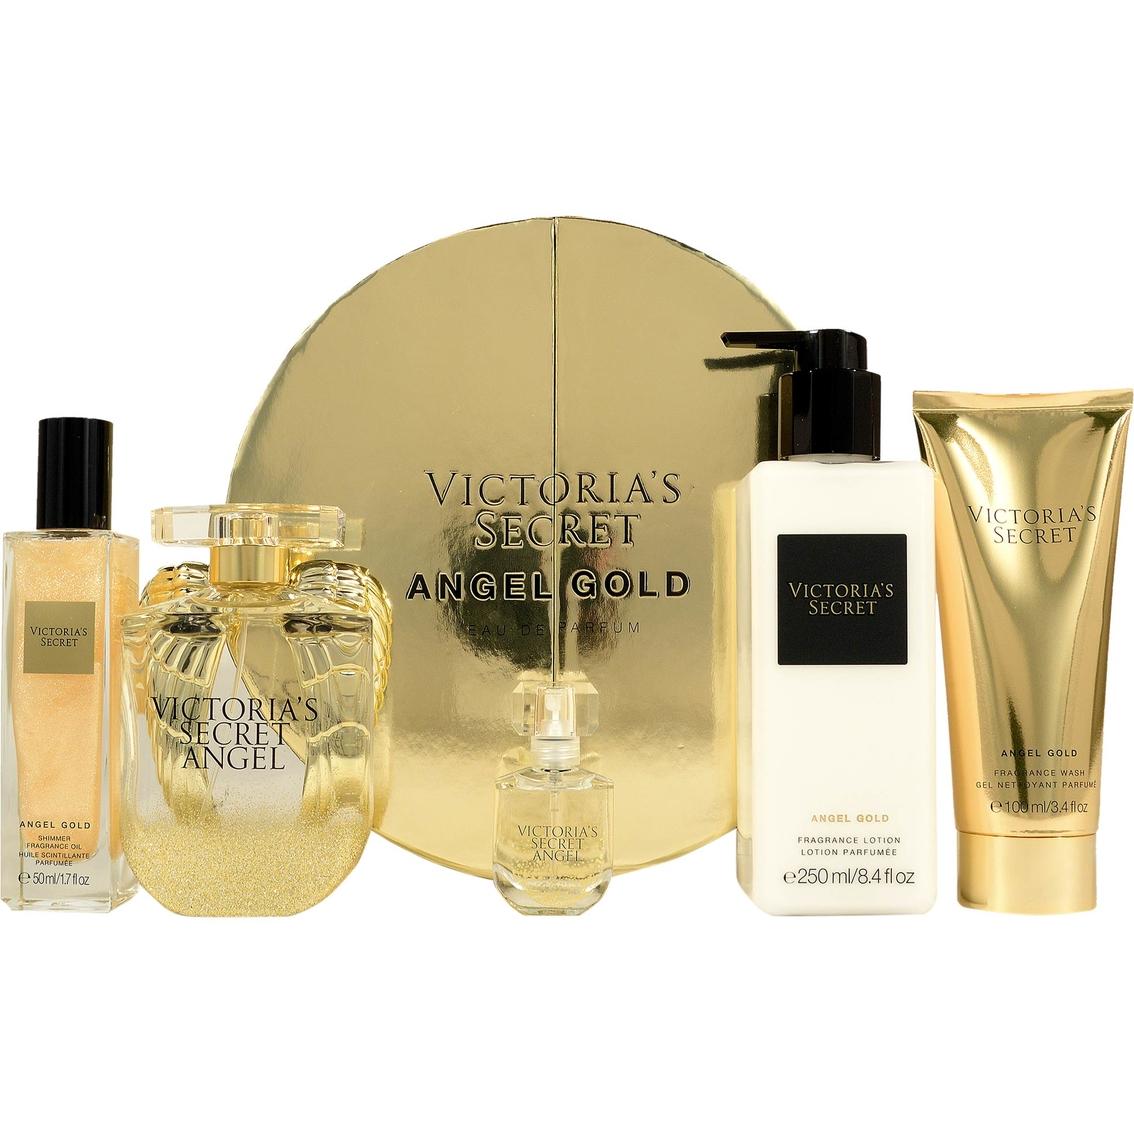 51637db8a78 Victoria s Secret Angel Gold Large Fragrance Box